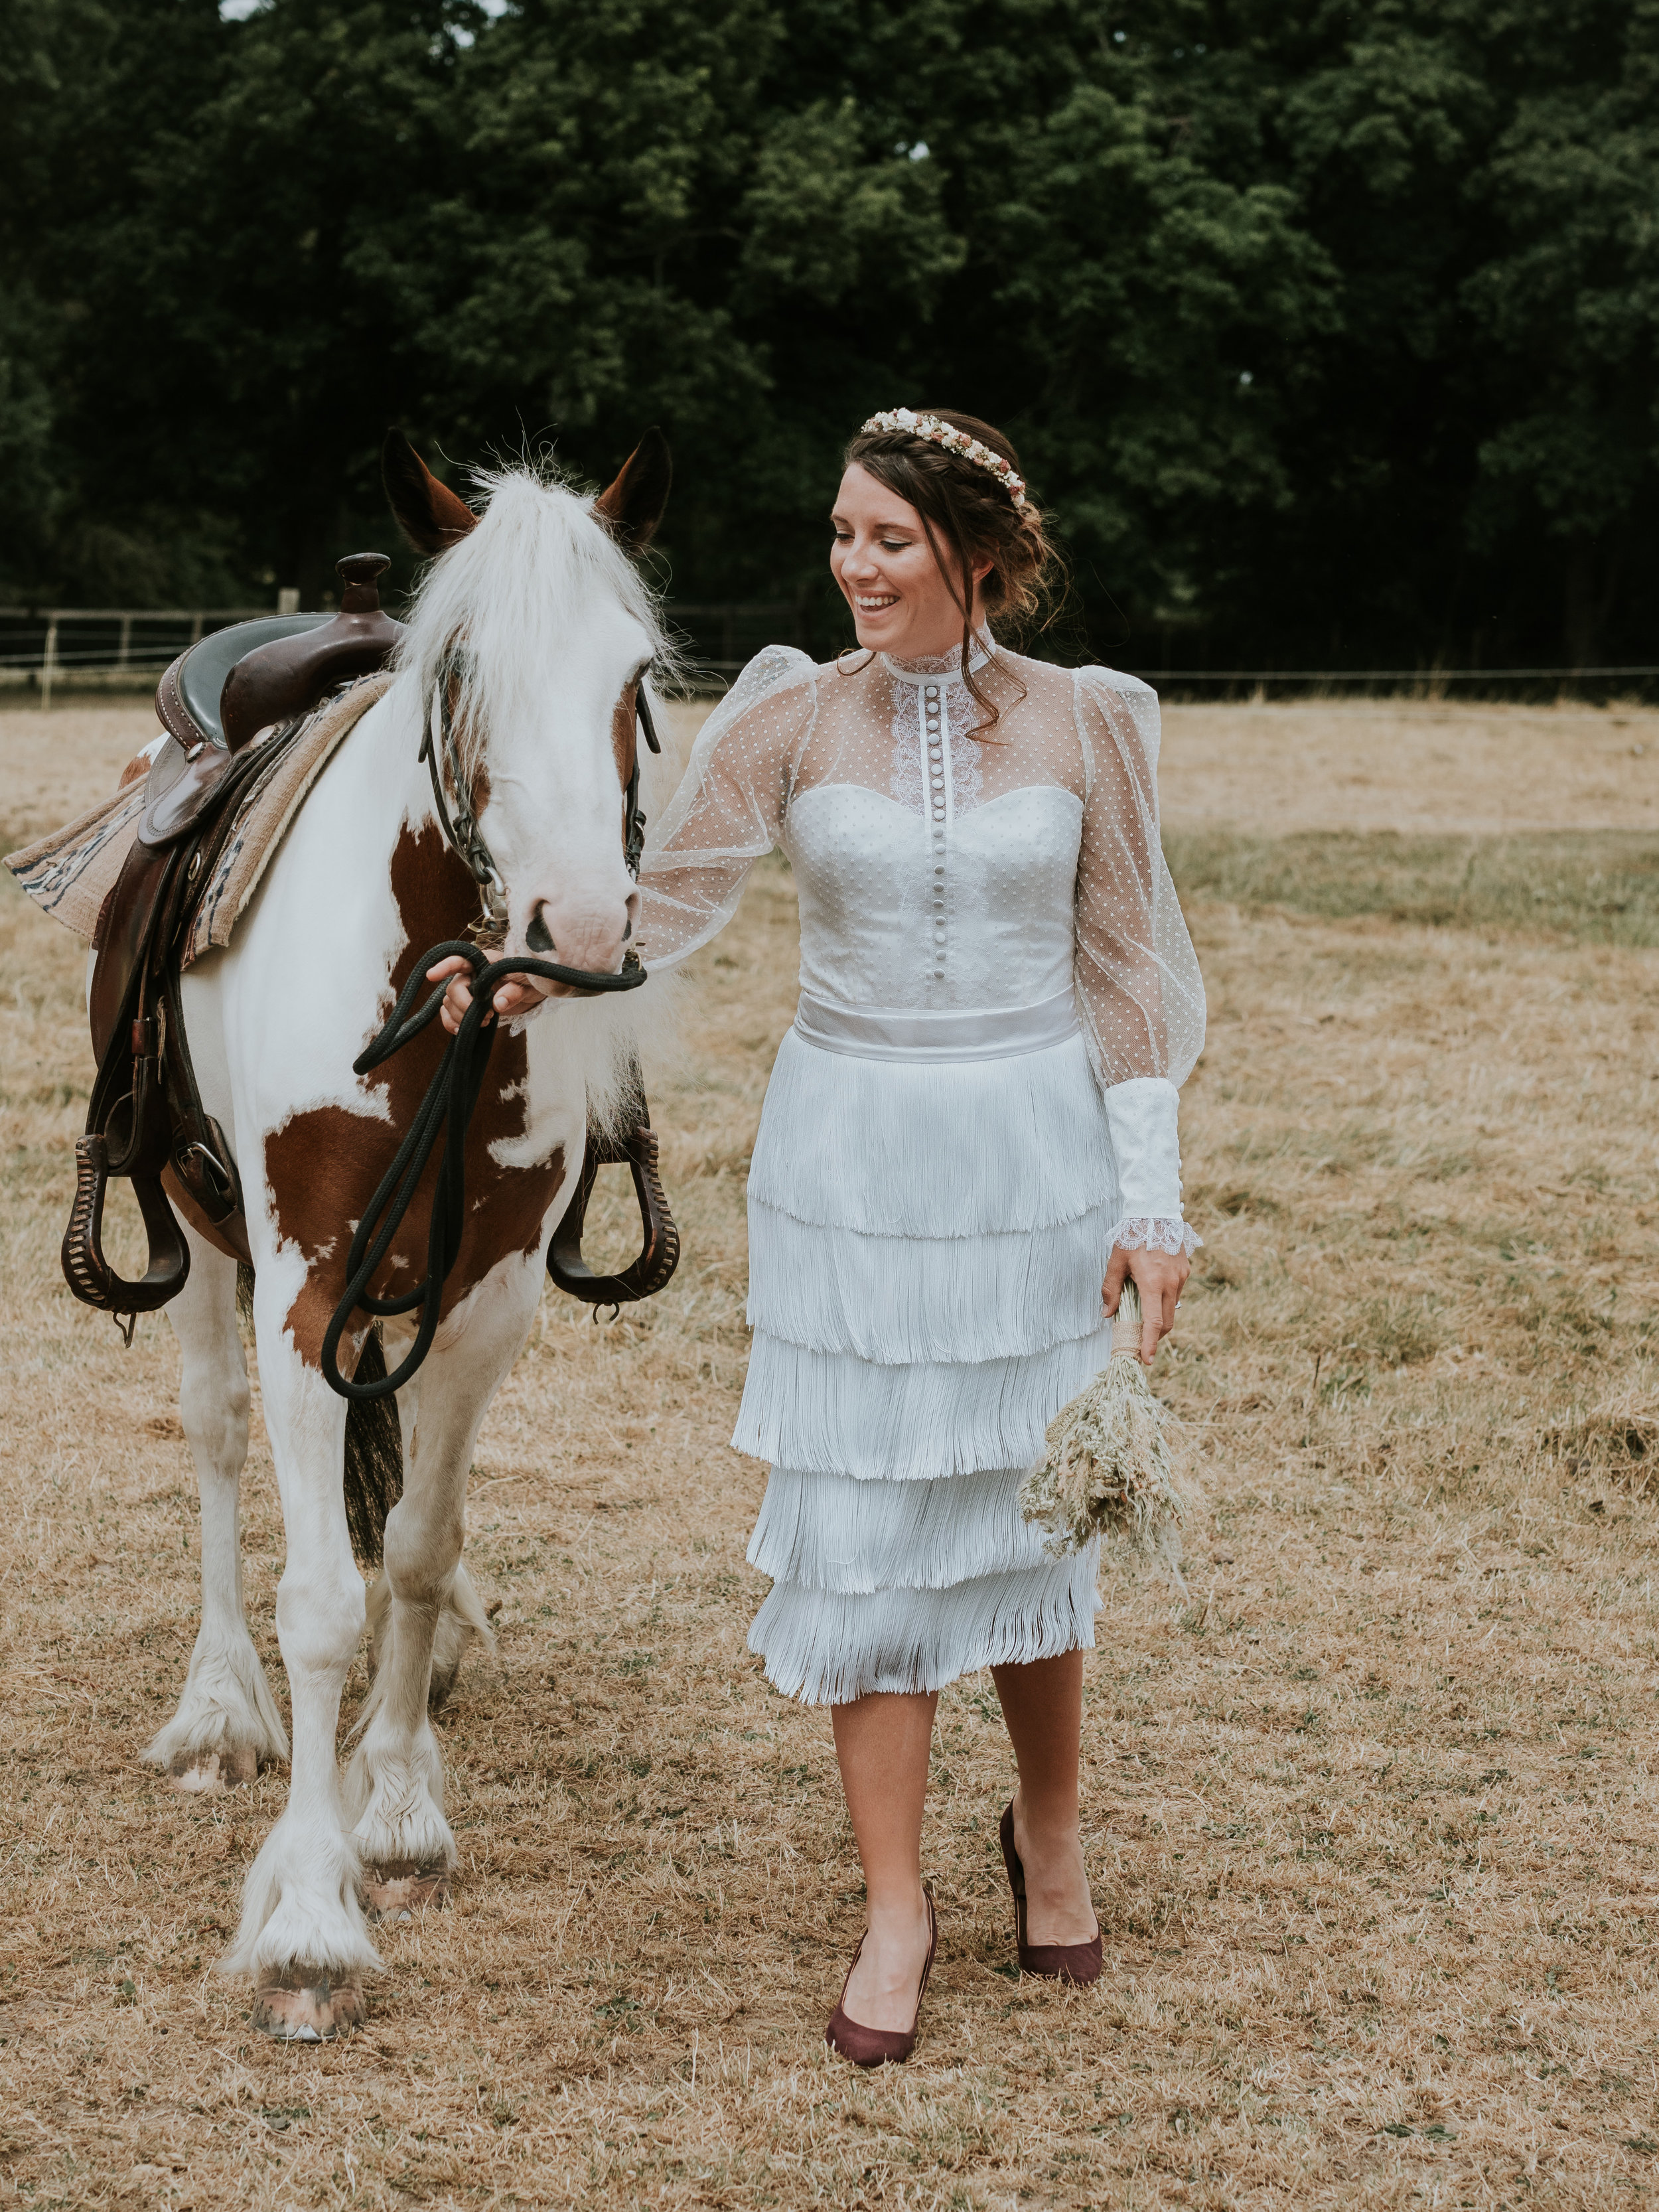 Jessica-Milberg-Photography-Brighton-London-Wedding-Fashion-Photographer-Creative-Wedding-Dress-27.jpg